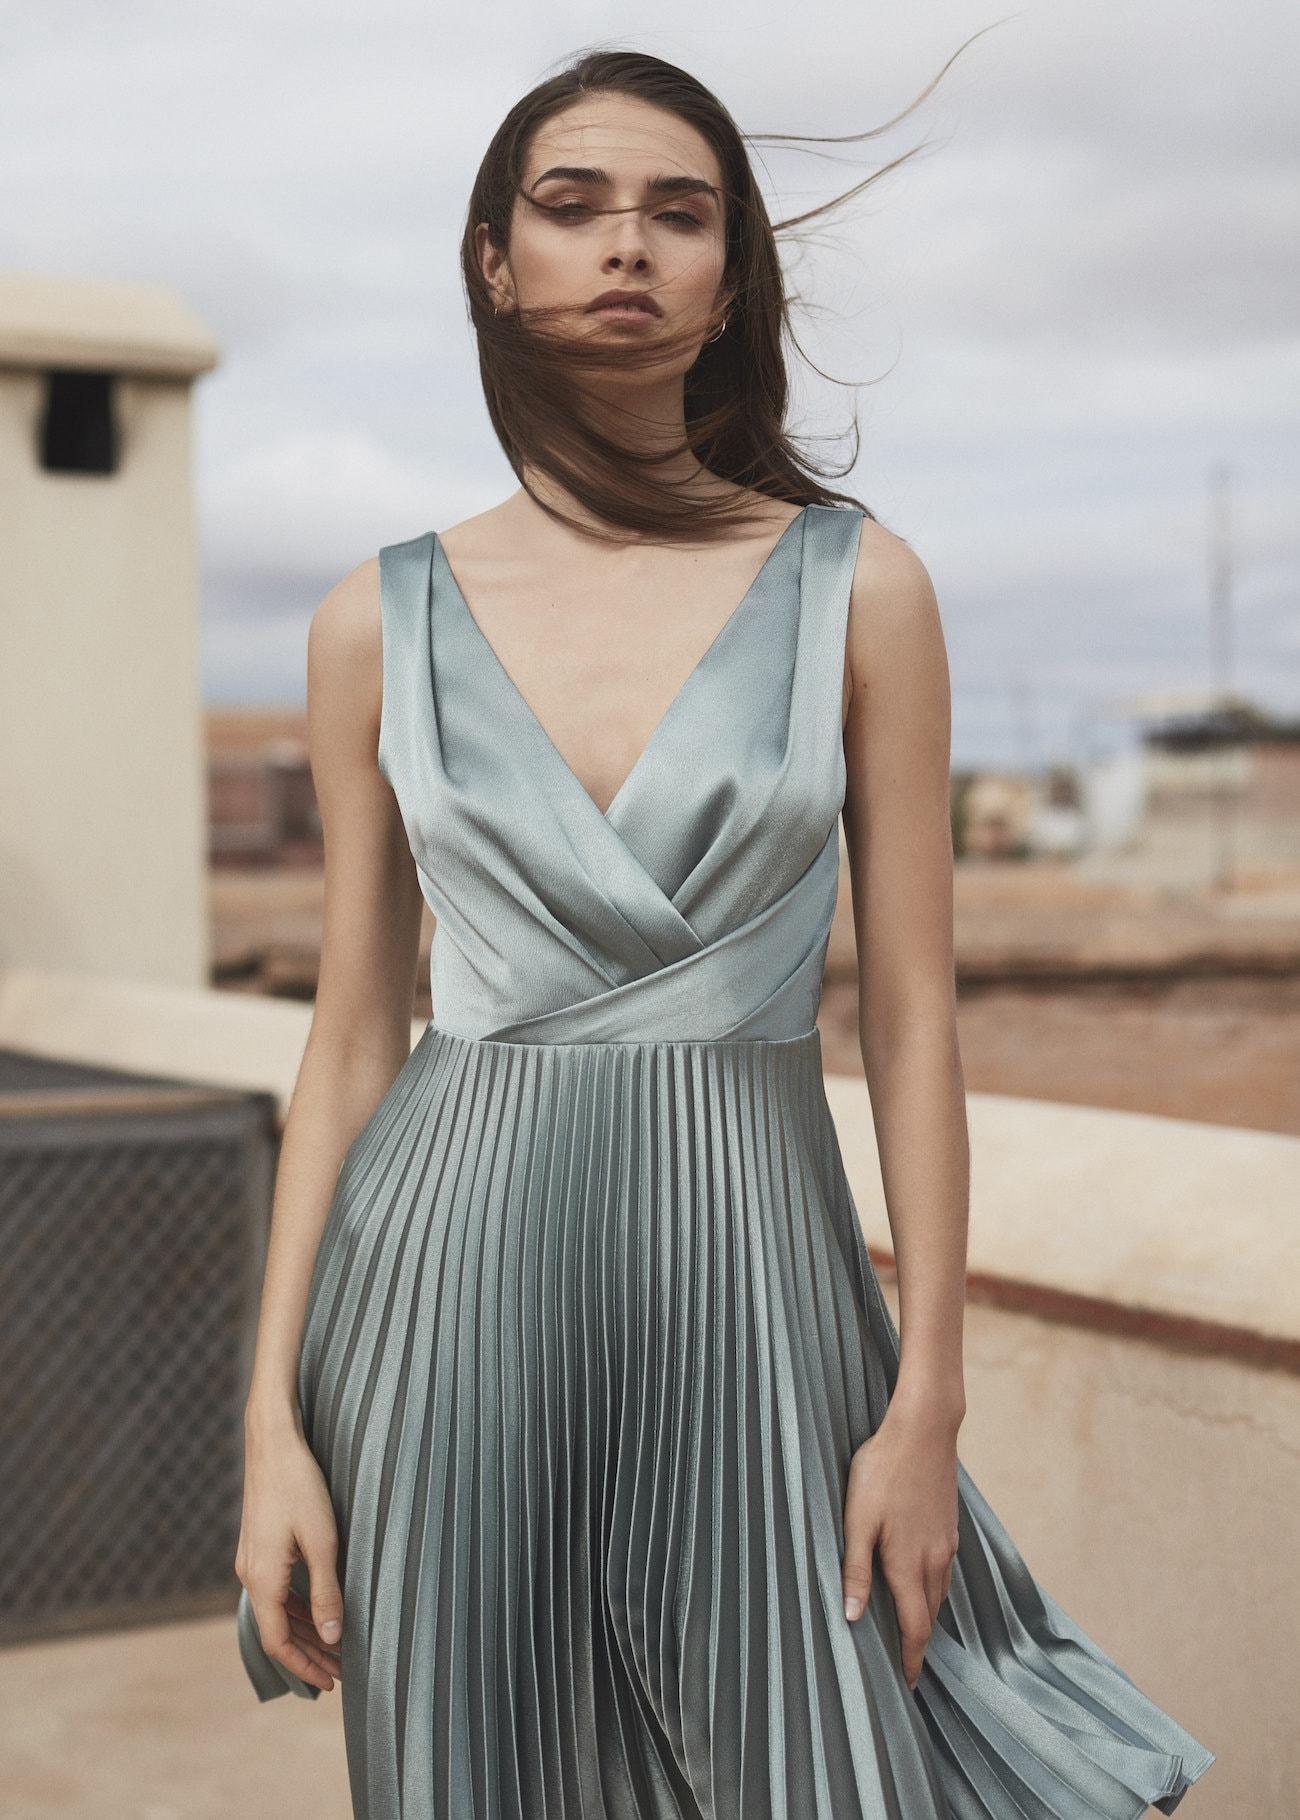 Reiss Alicia Knife-pleat Midi Dress for Bridesmaid Dress